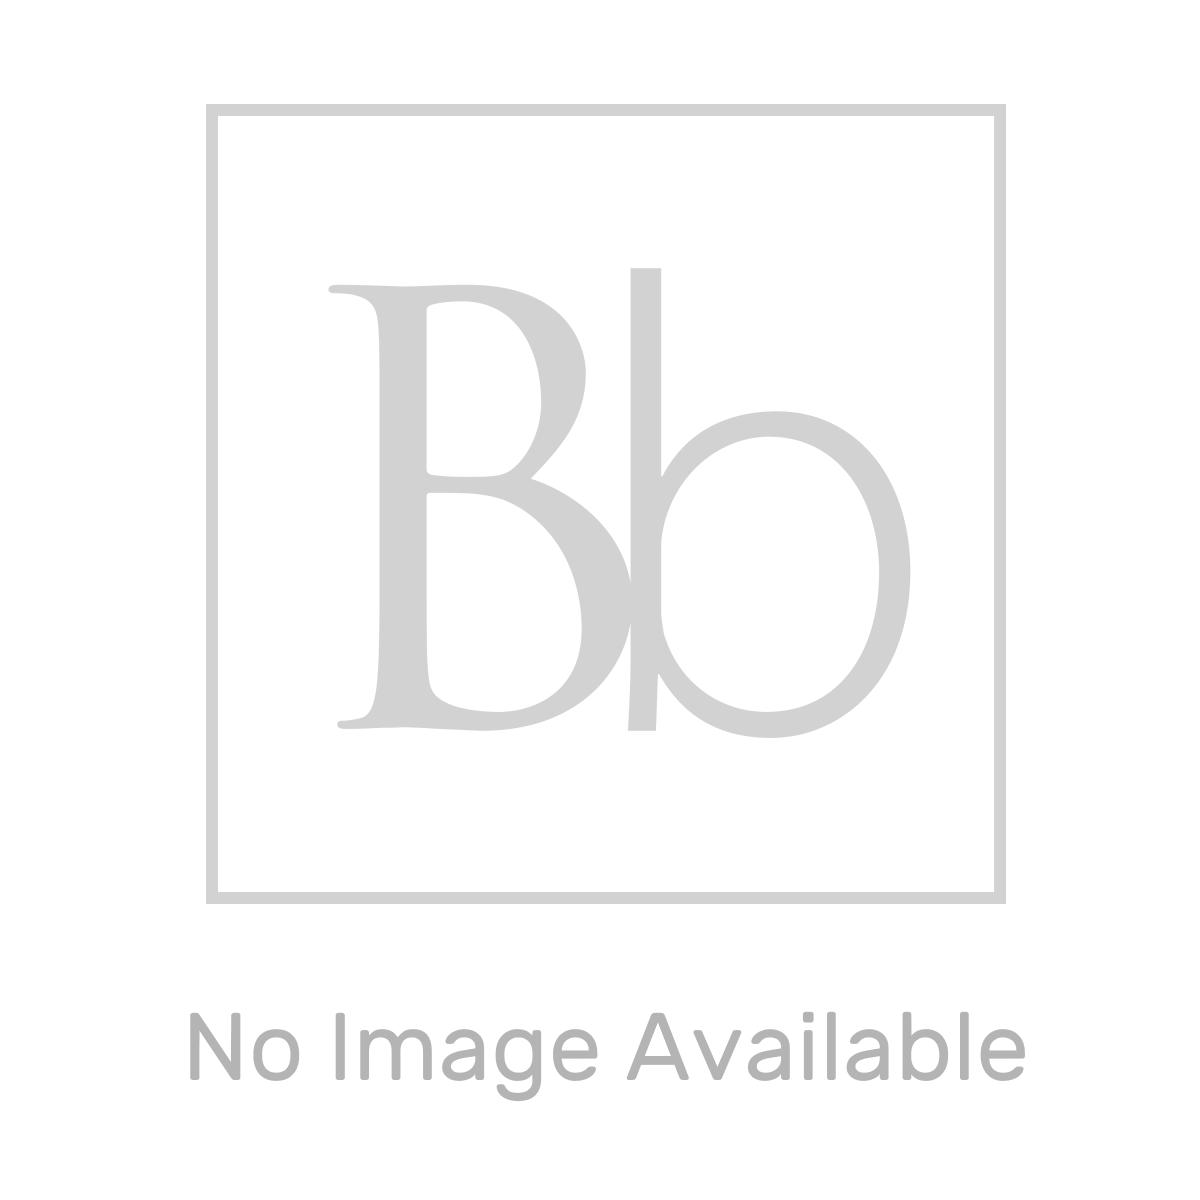 Nuie Athena Hacienda Black Double Mirrored Bathroom Cabinet 800mm Line Drawing